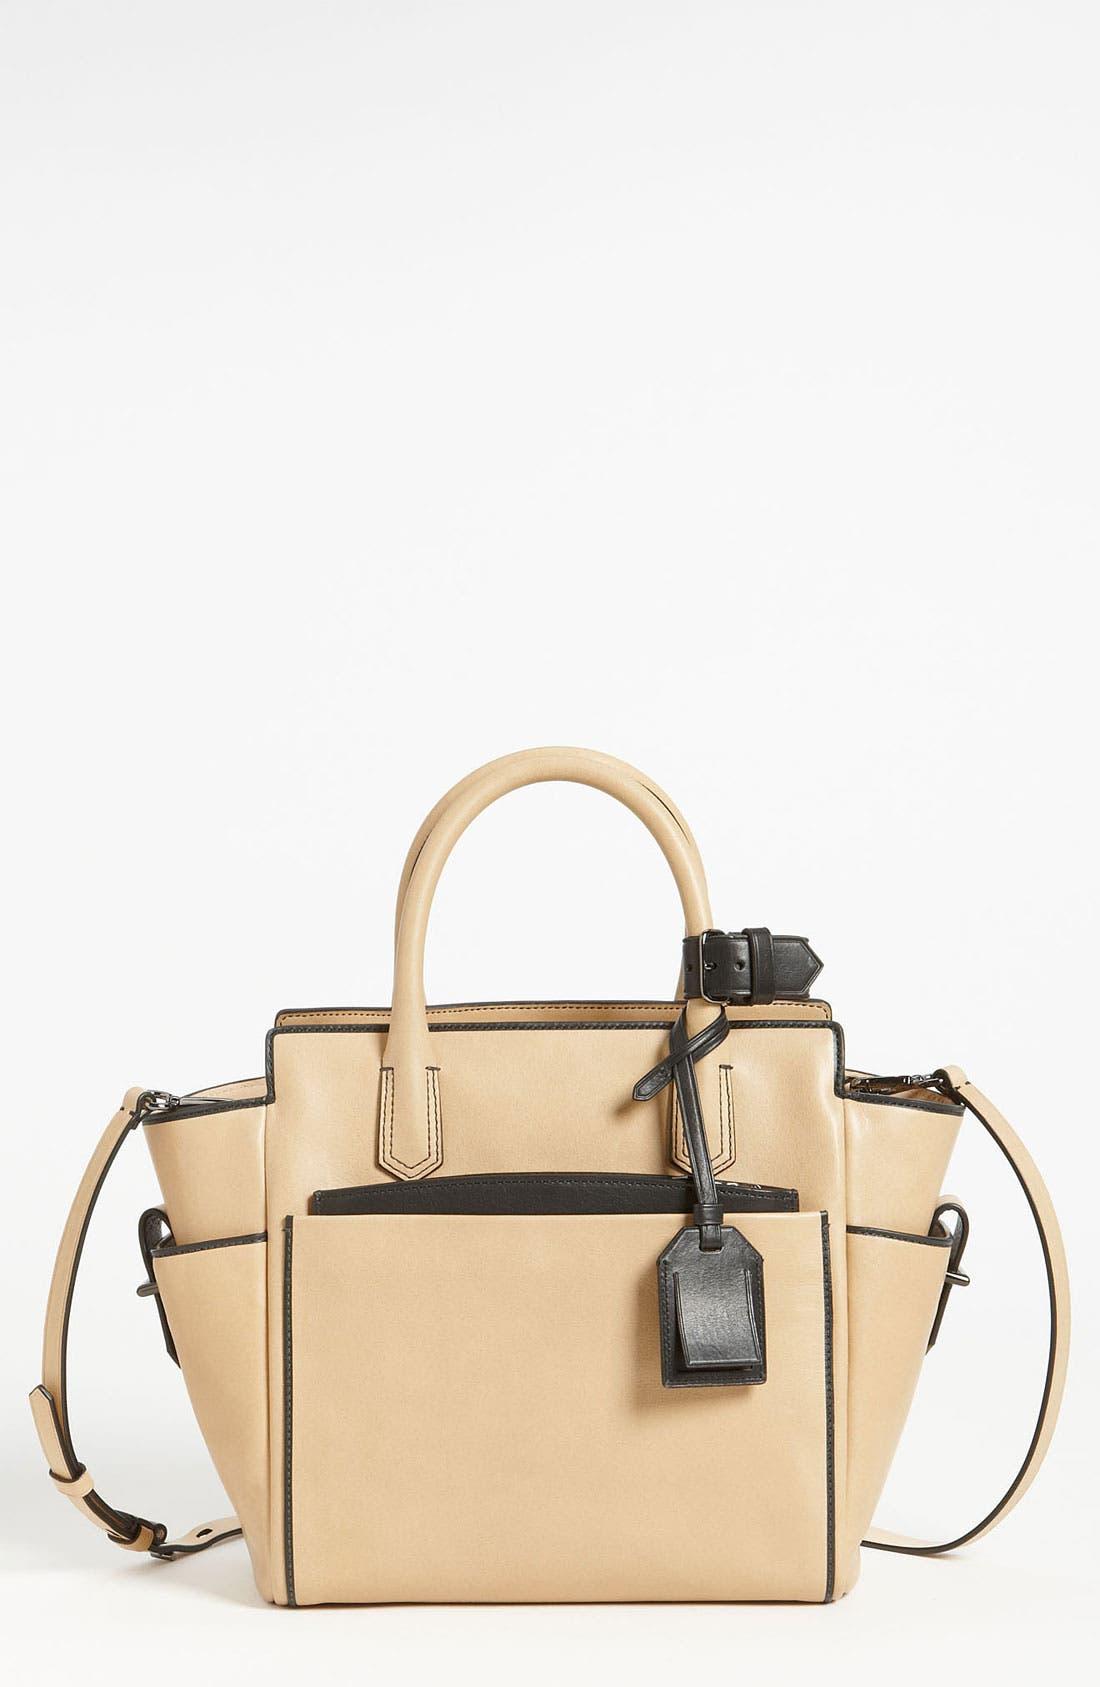 Main Image - Reed Krakoff 'Mini Atlantique' Leather Satchel